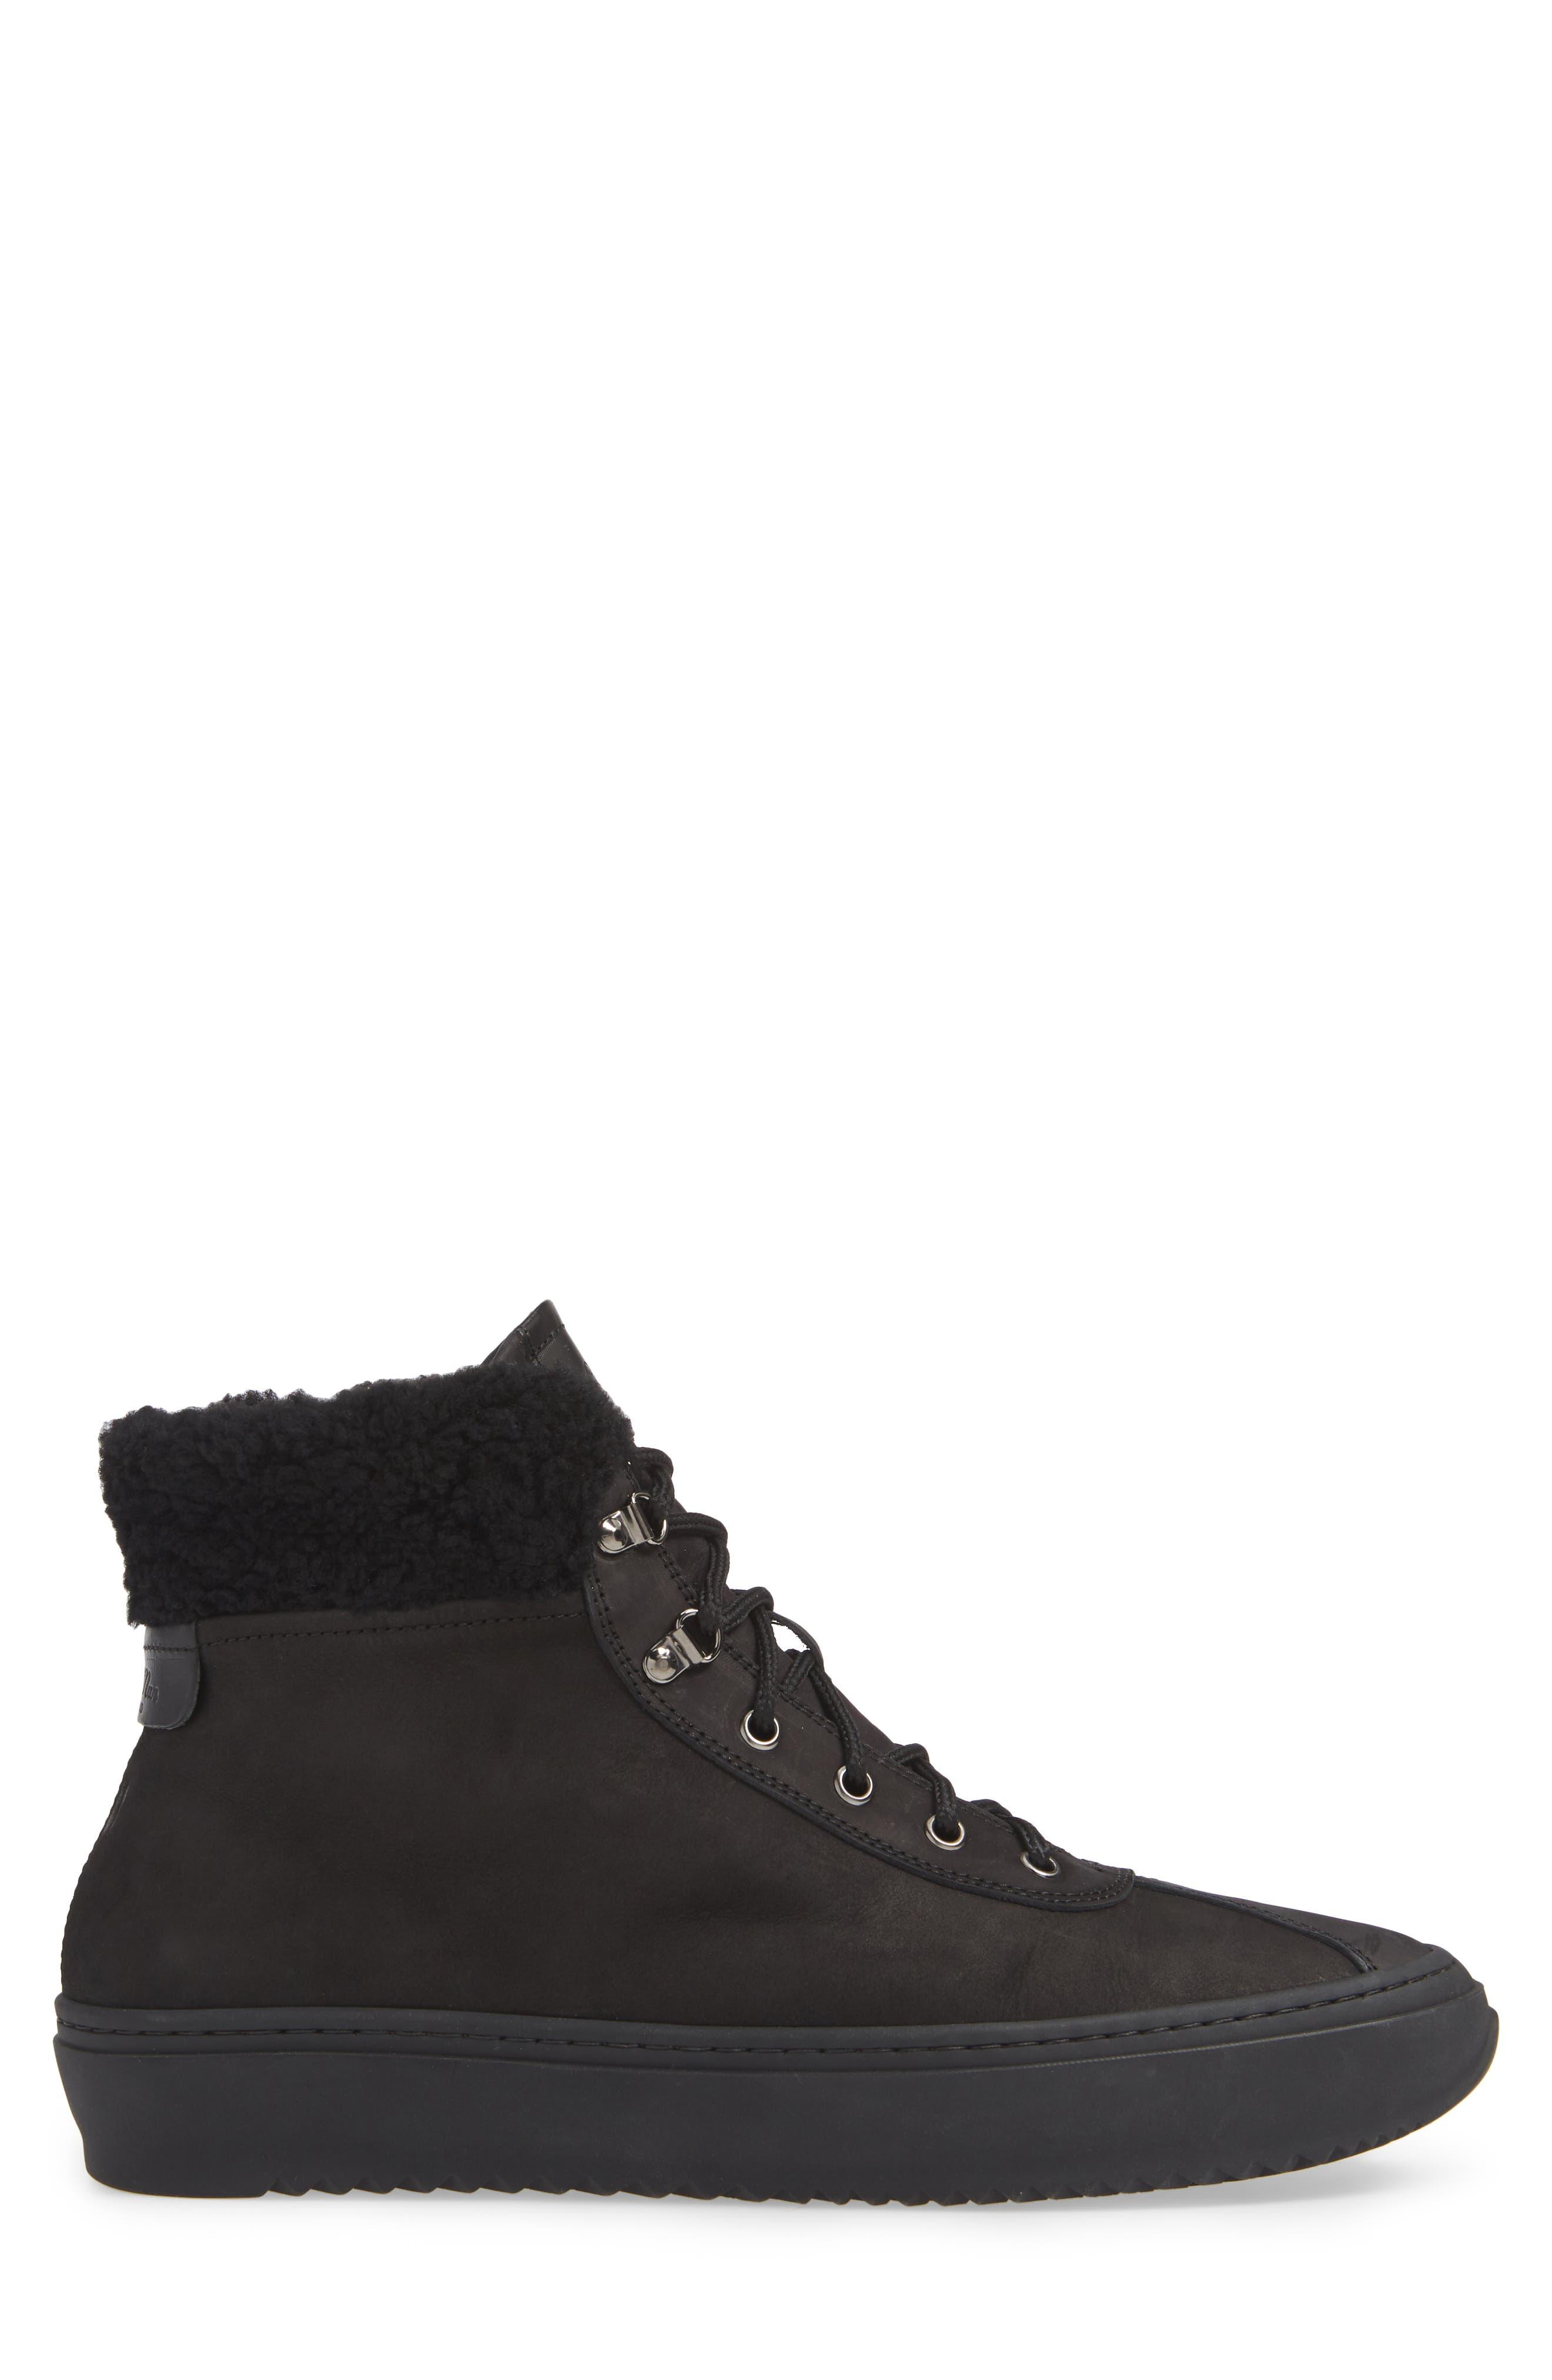 Hiker Street Sneaker,                             Alternate thumbnail 3, color,                             BLACK LEATHER